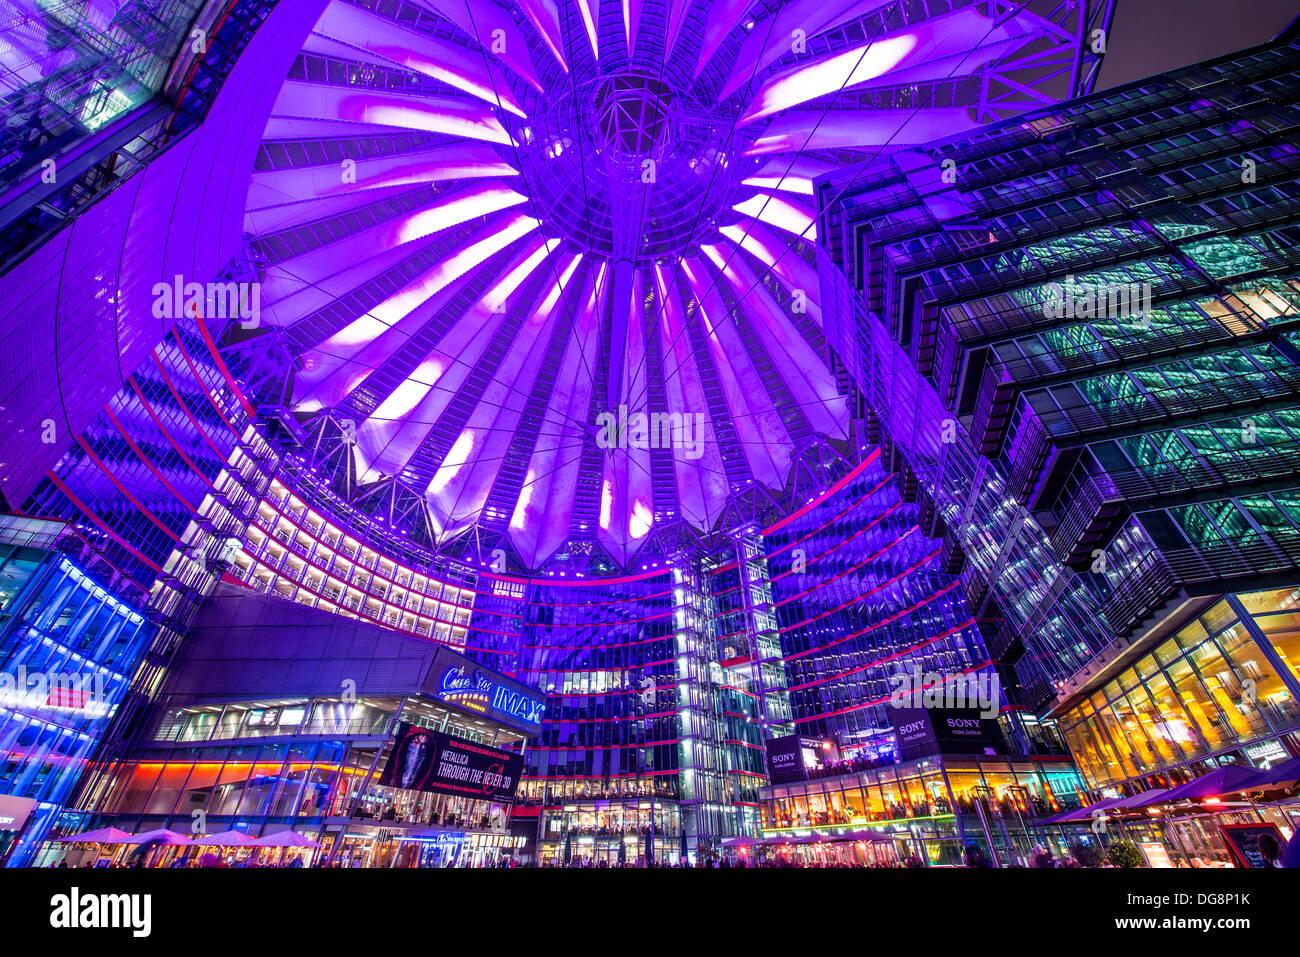 Sony Center in Berlin, Germany. Stock Photo